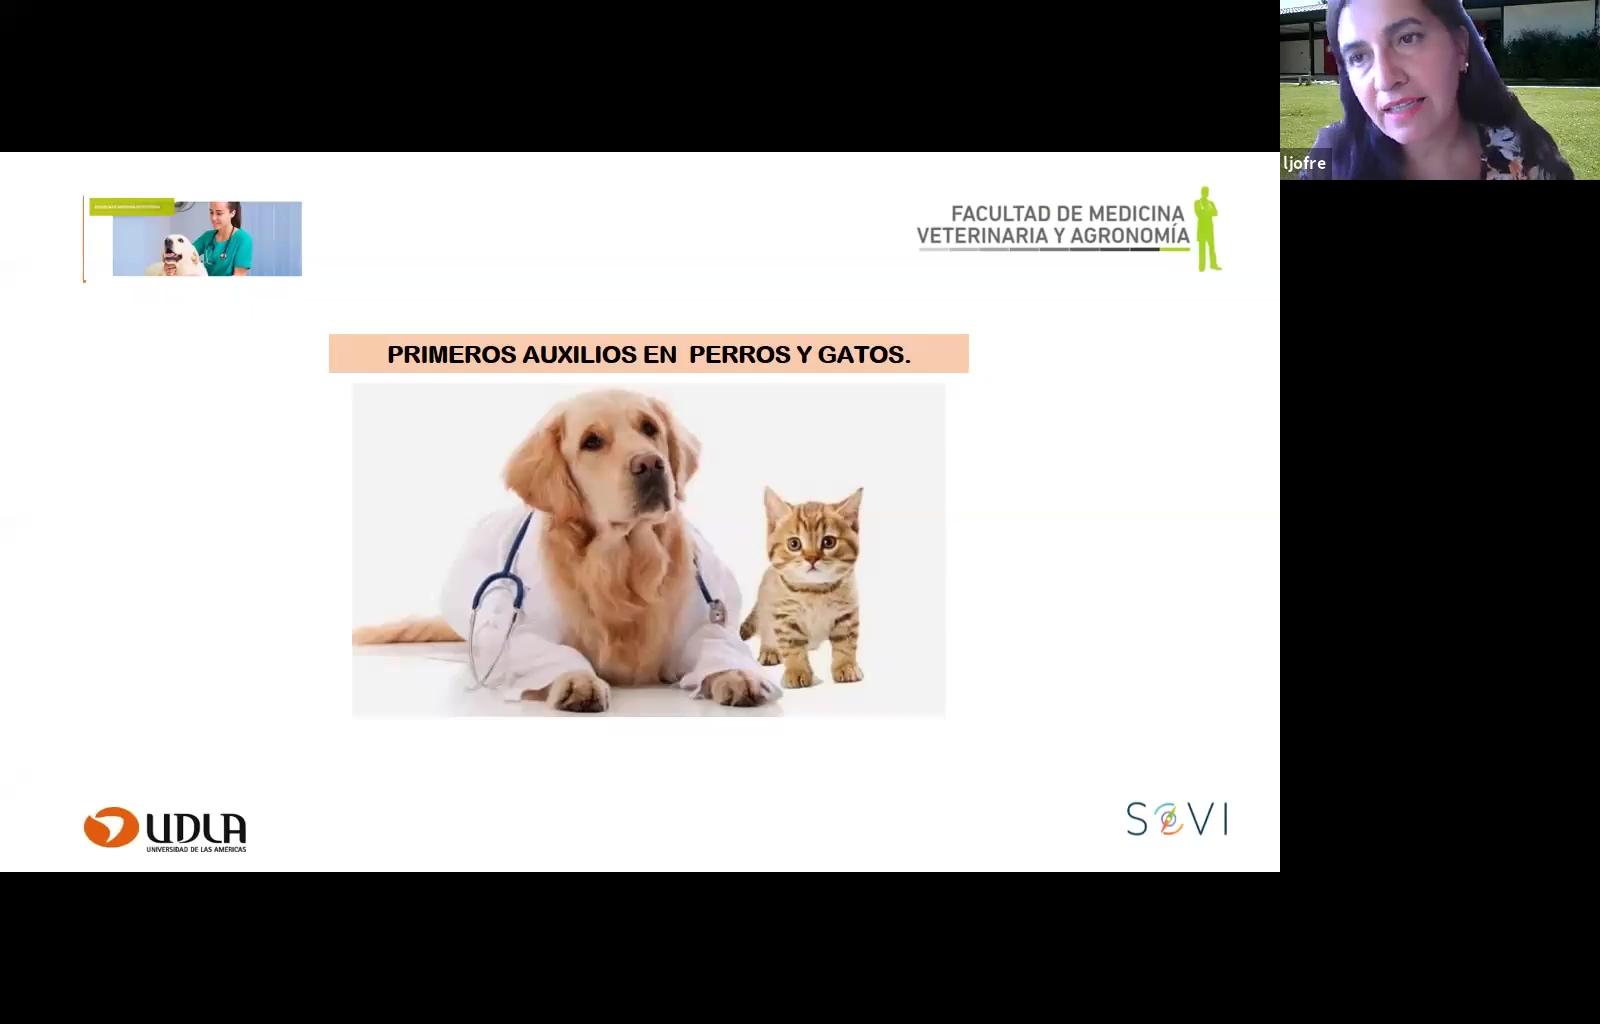 Taller de primeros auxilios veterinaria diciembre 2020